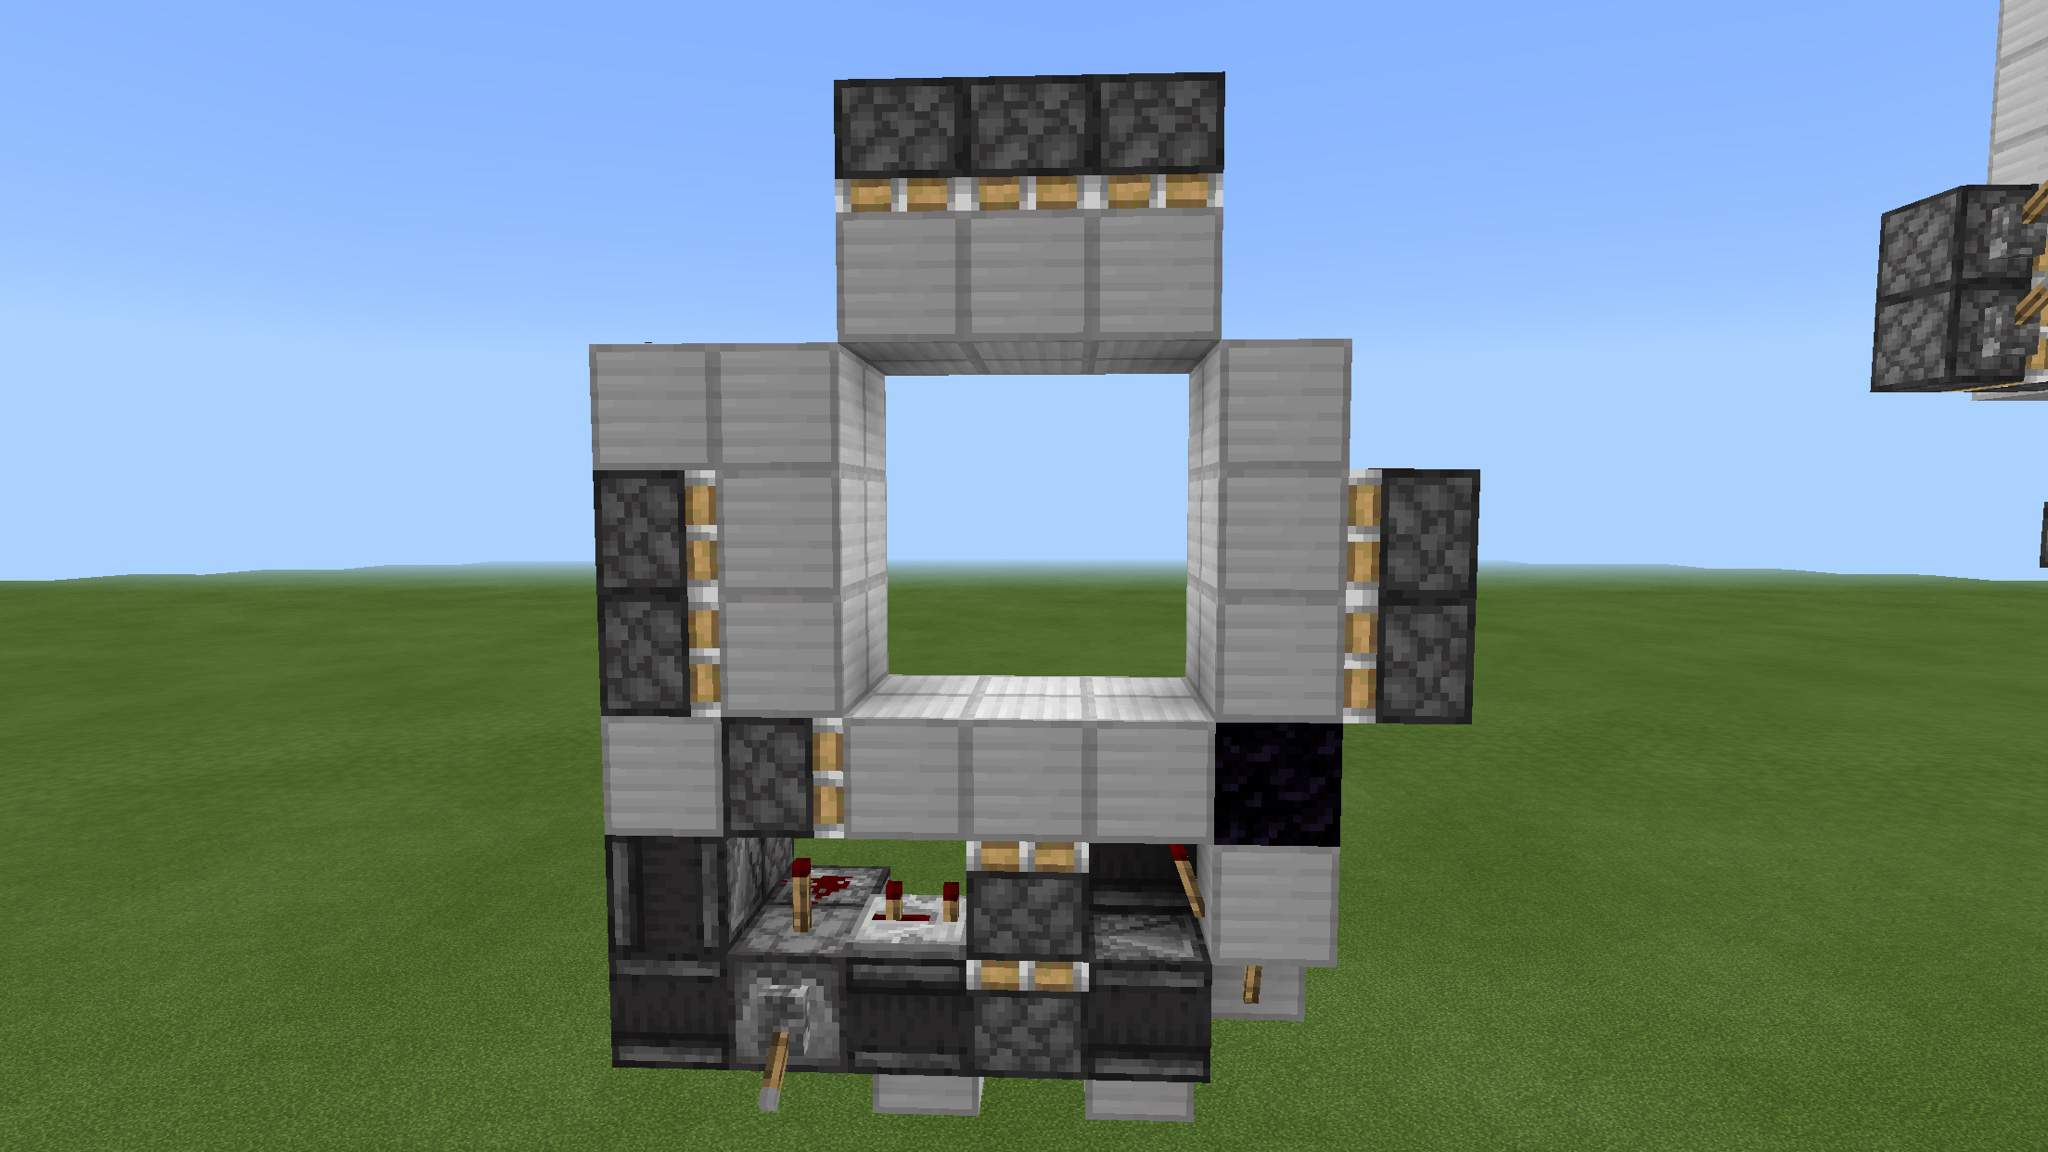 Tiny 9x9 Piston Door Tutorial + Challenge  Minecraft Amino